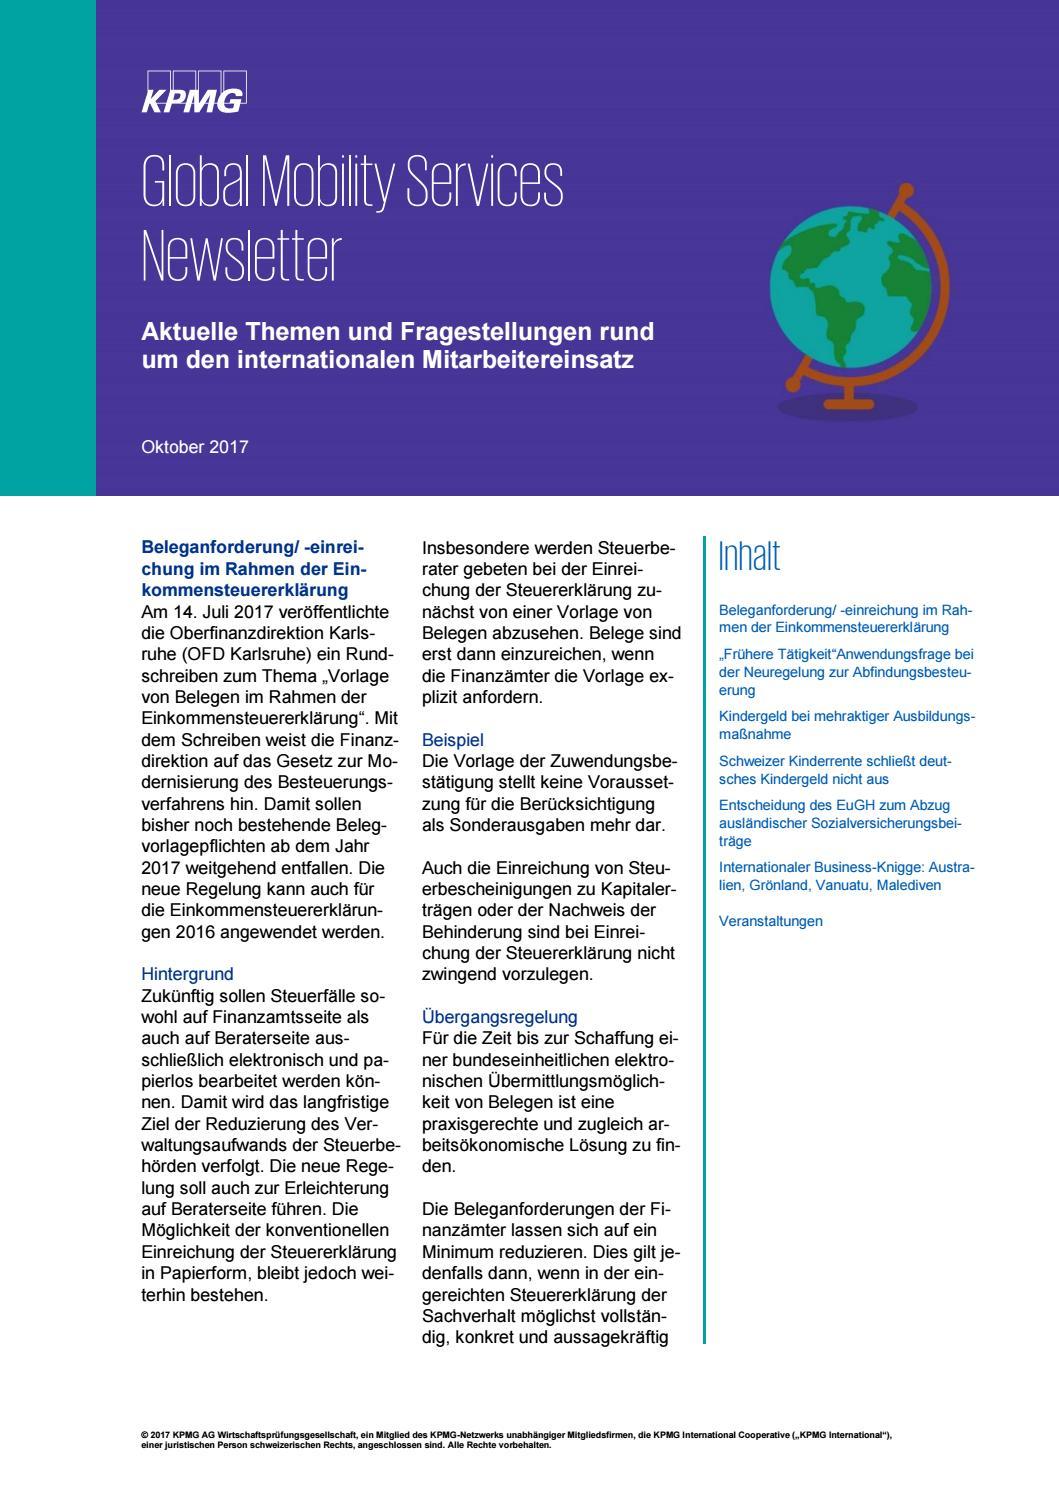 GMS Newsletter Oktober 2017 by KPMG.DE - issuu